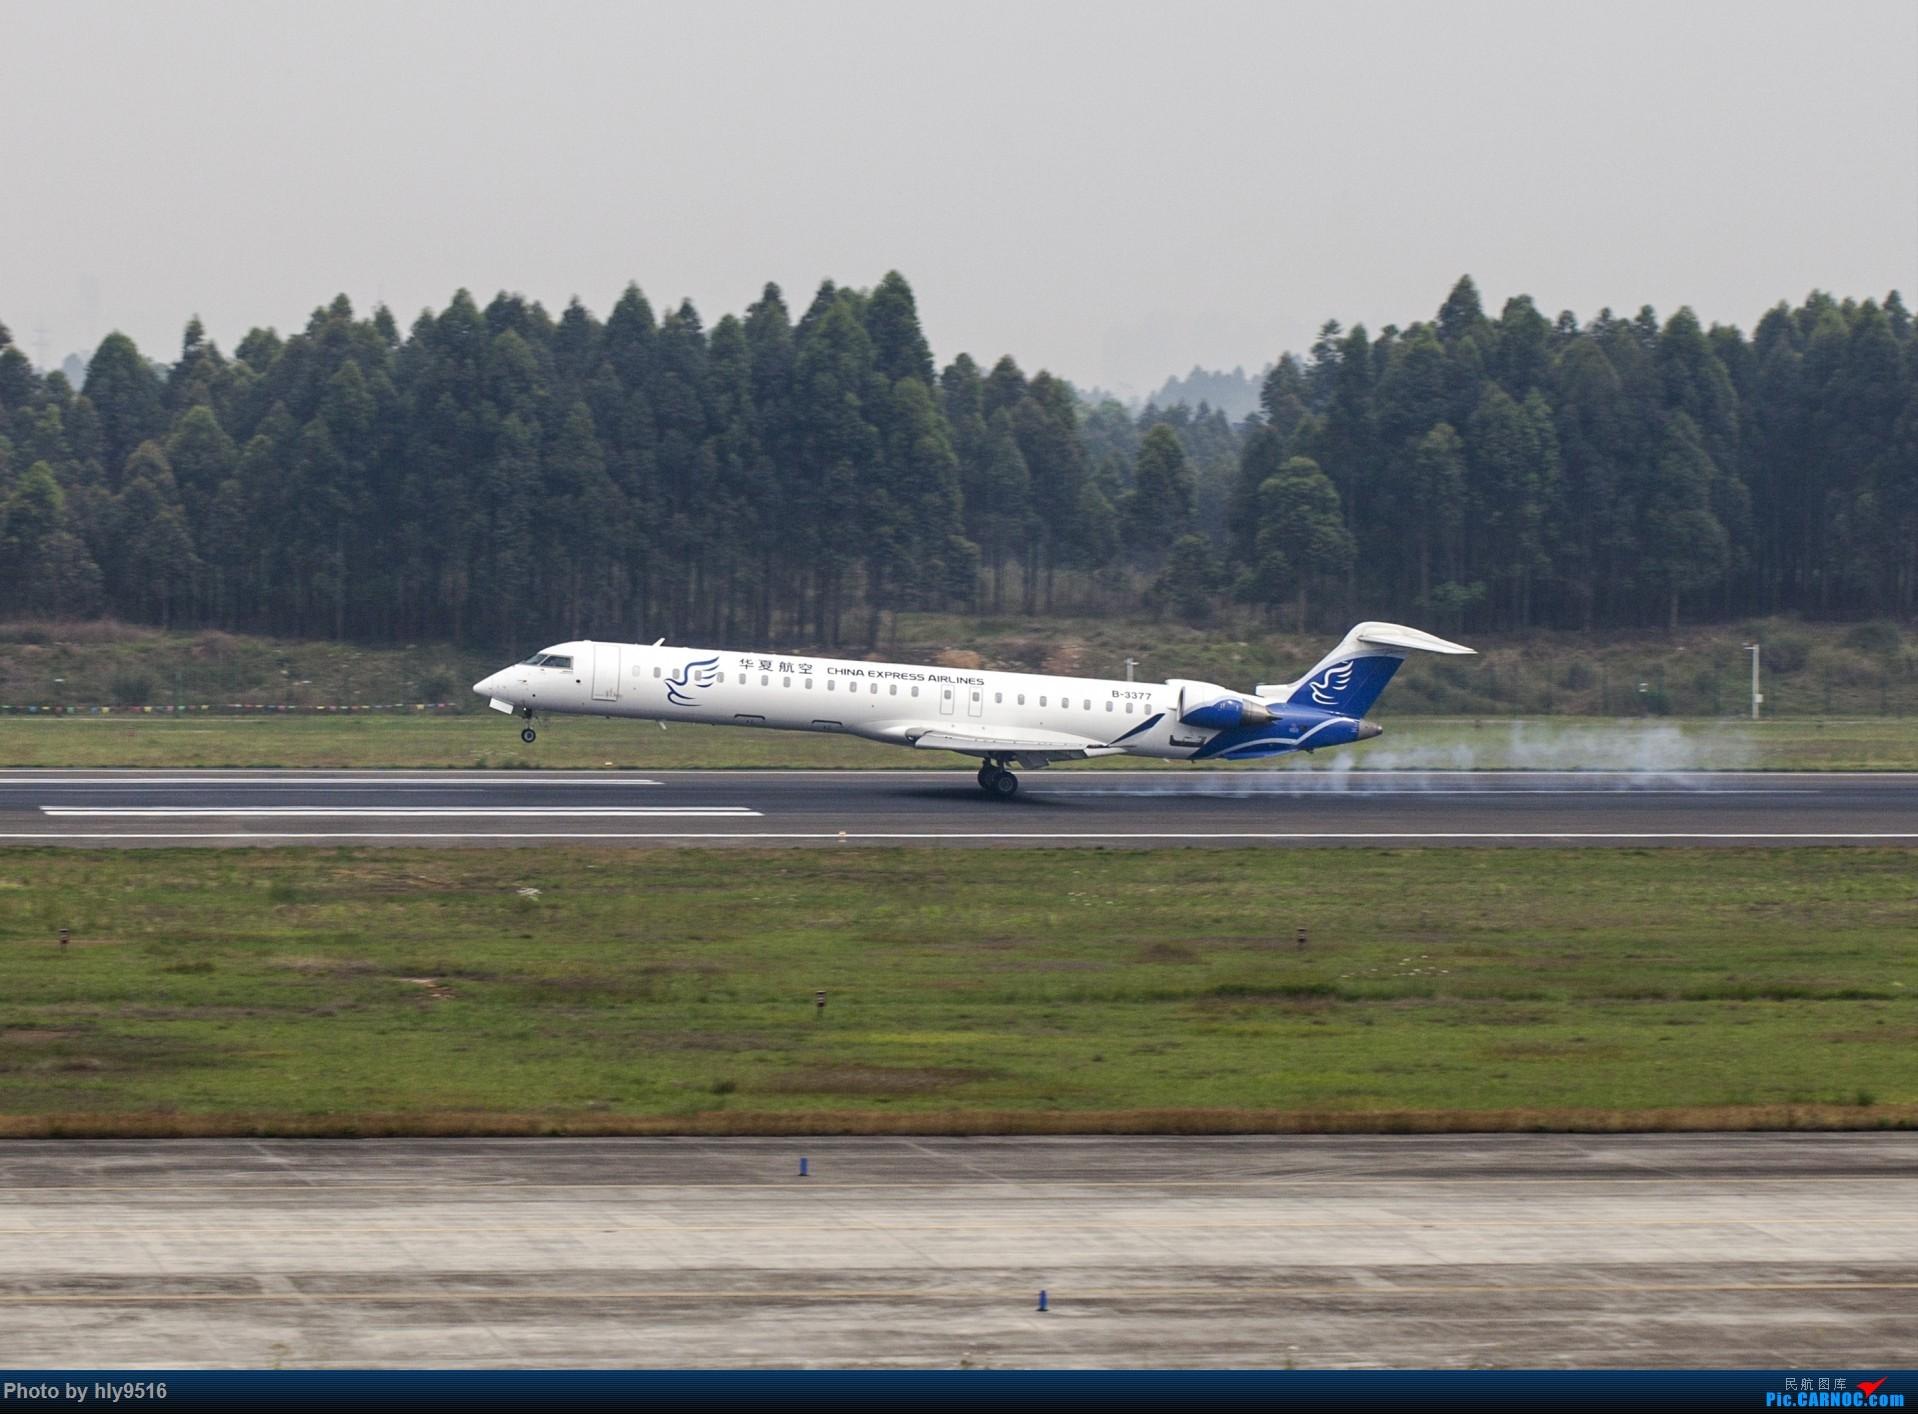 Re:[原创]【CTU】终于解决了大怨念南航A380 偶遇长荣新涂装 两次复飞 小怨念若干 BOMBARDIER CRJ900NG B-3377 中国成都双流国际机场